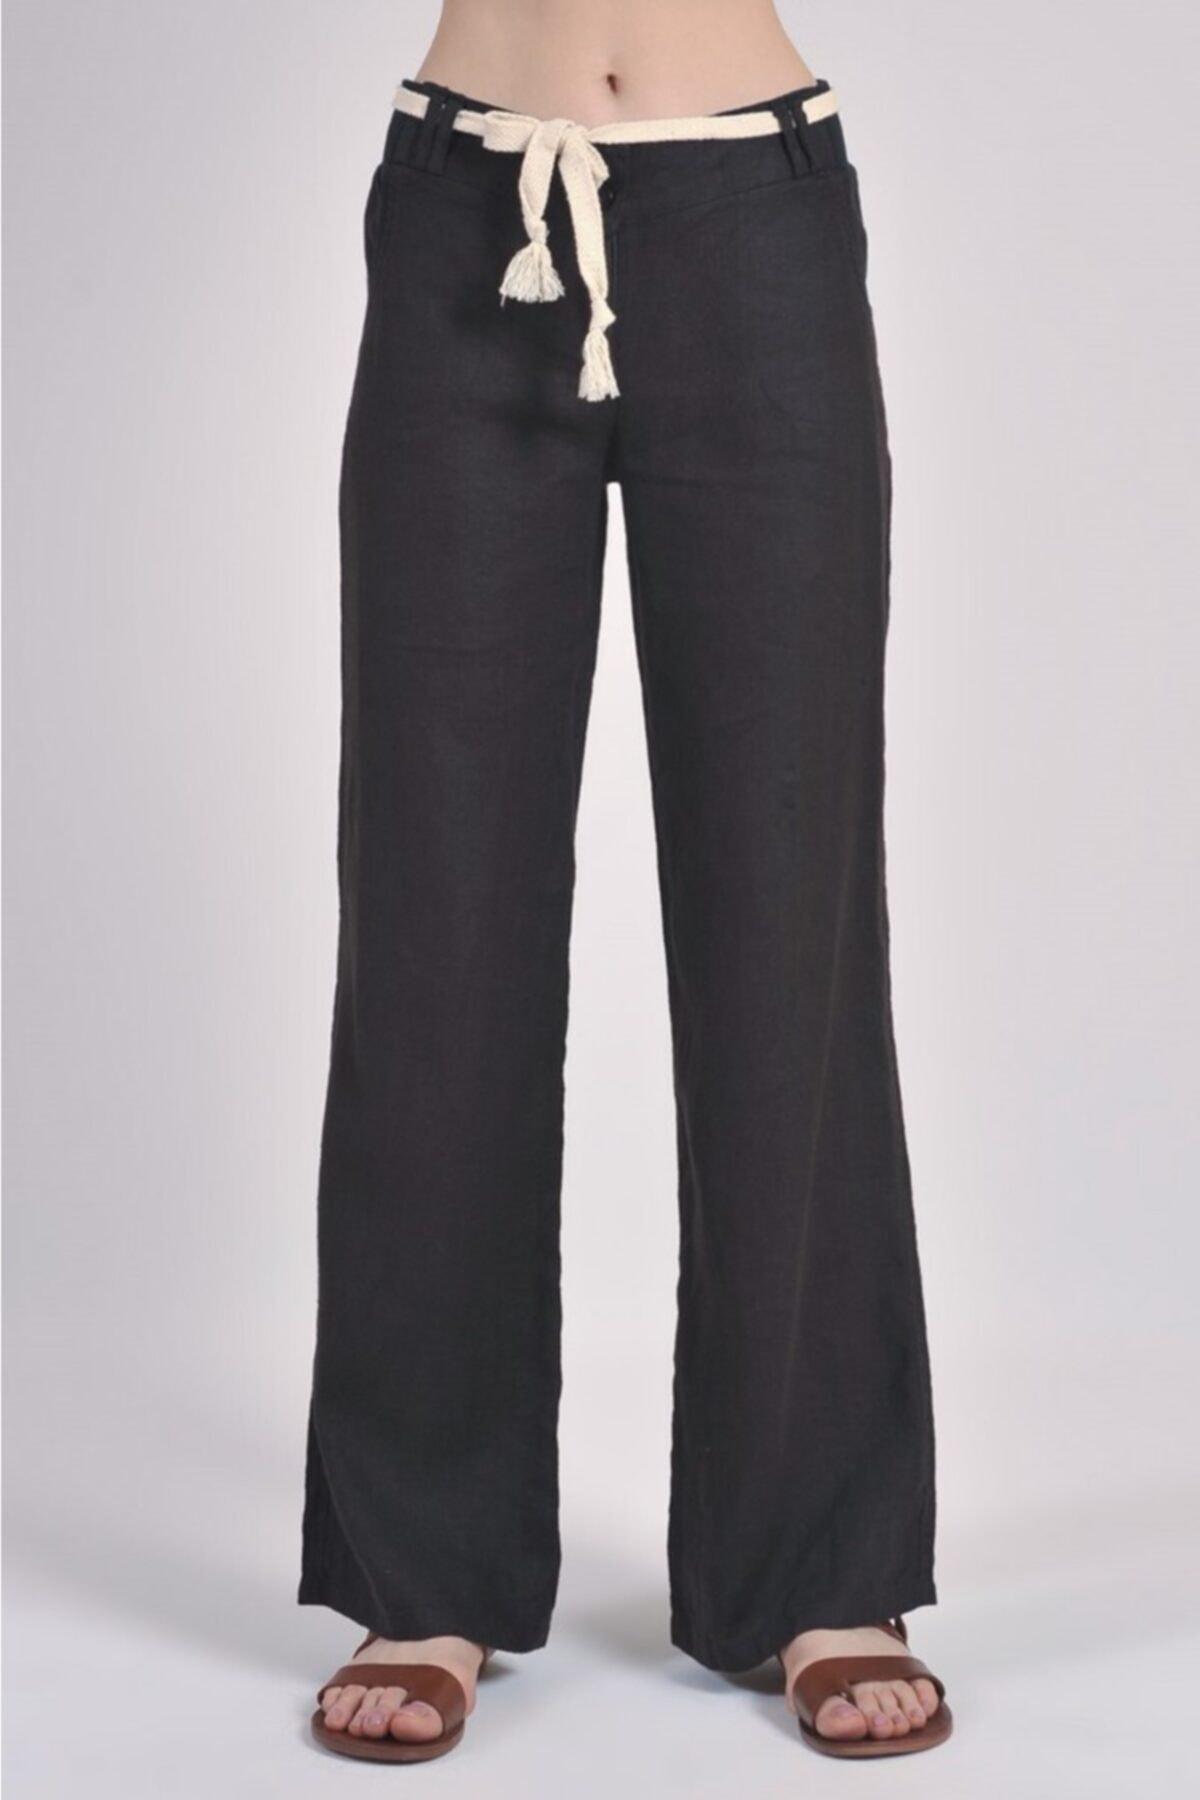 Yame Kadın Siyah Ribanalı İp Kemerli Keten Pantolon Gw 2